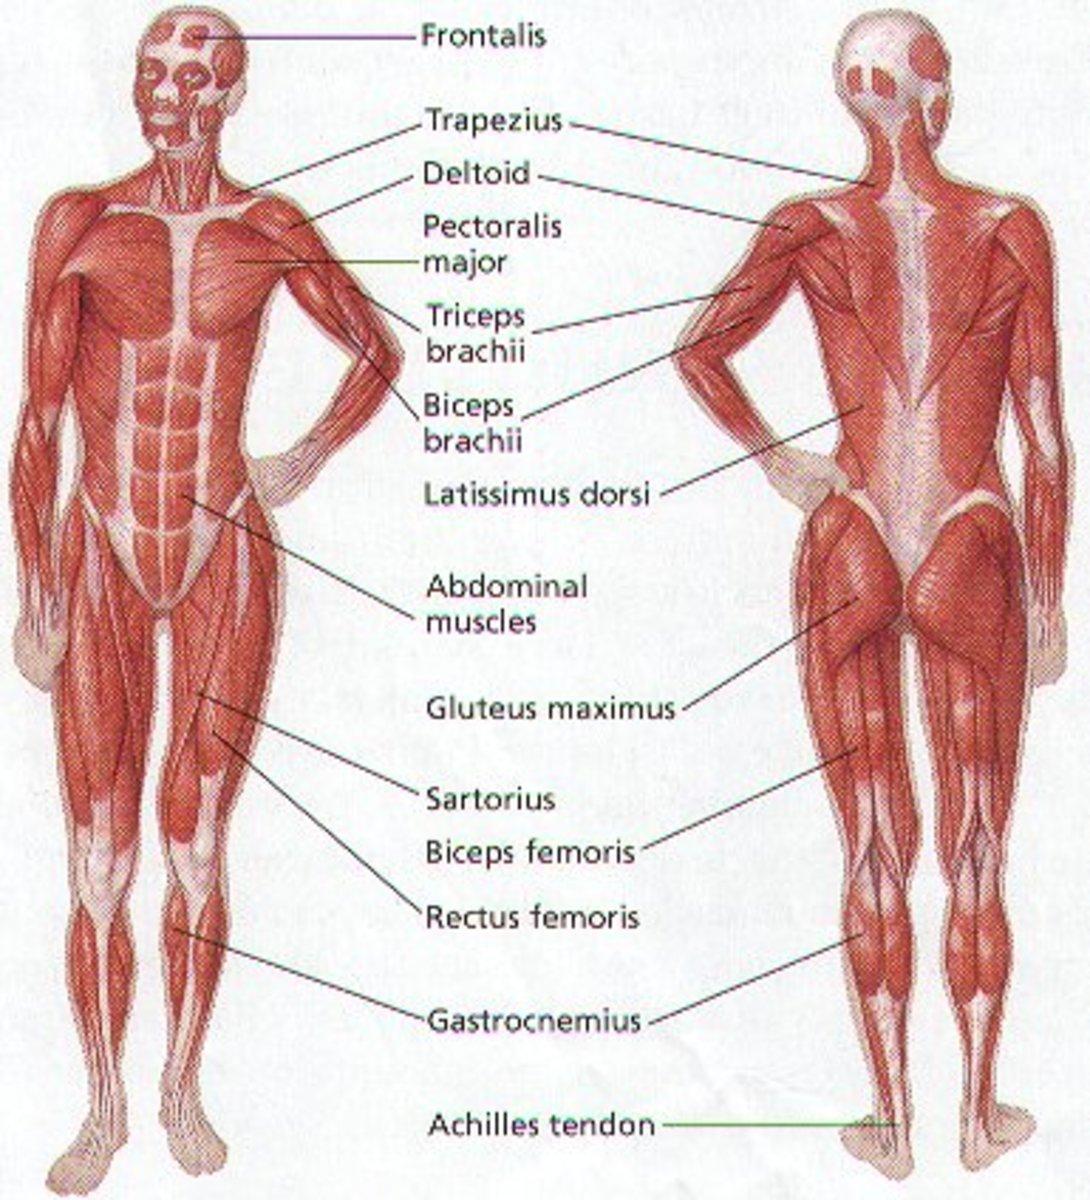 HUMAN BODY MUSCULAR SYSTEM